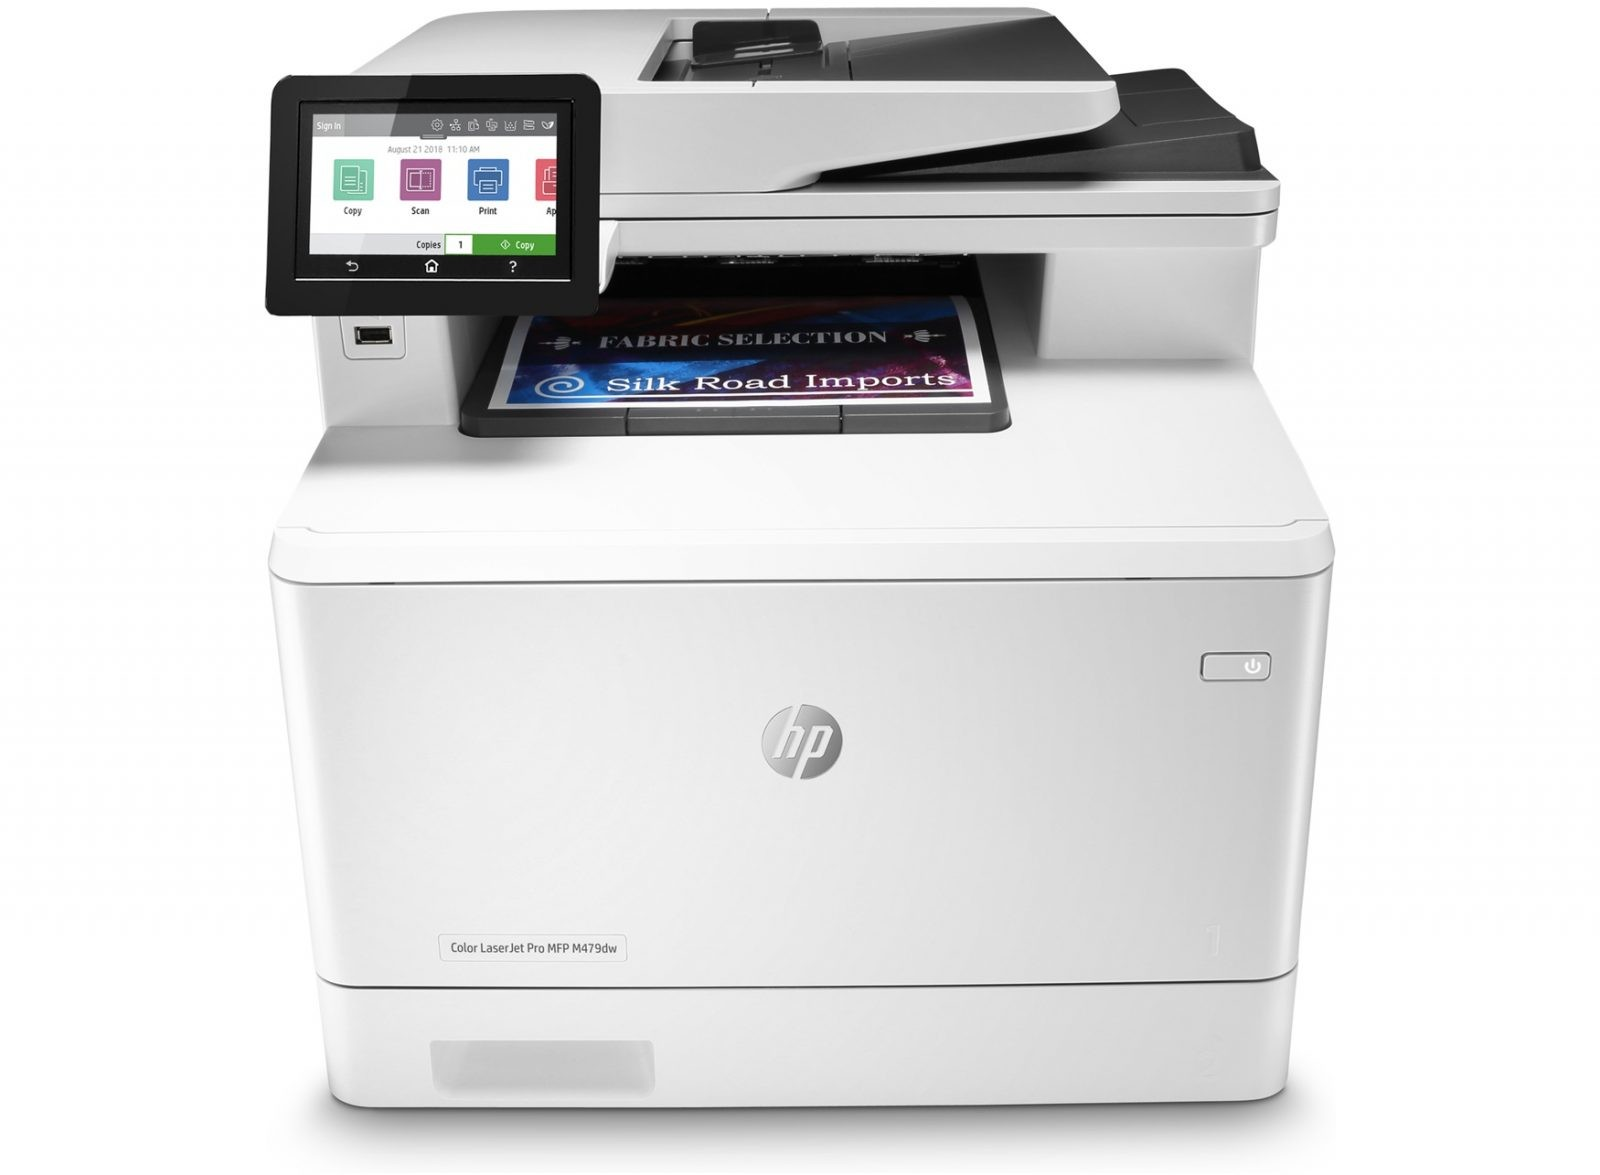 HP Color LaserJet Pro MFP M479dw Wireless Printer